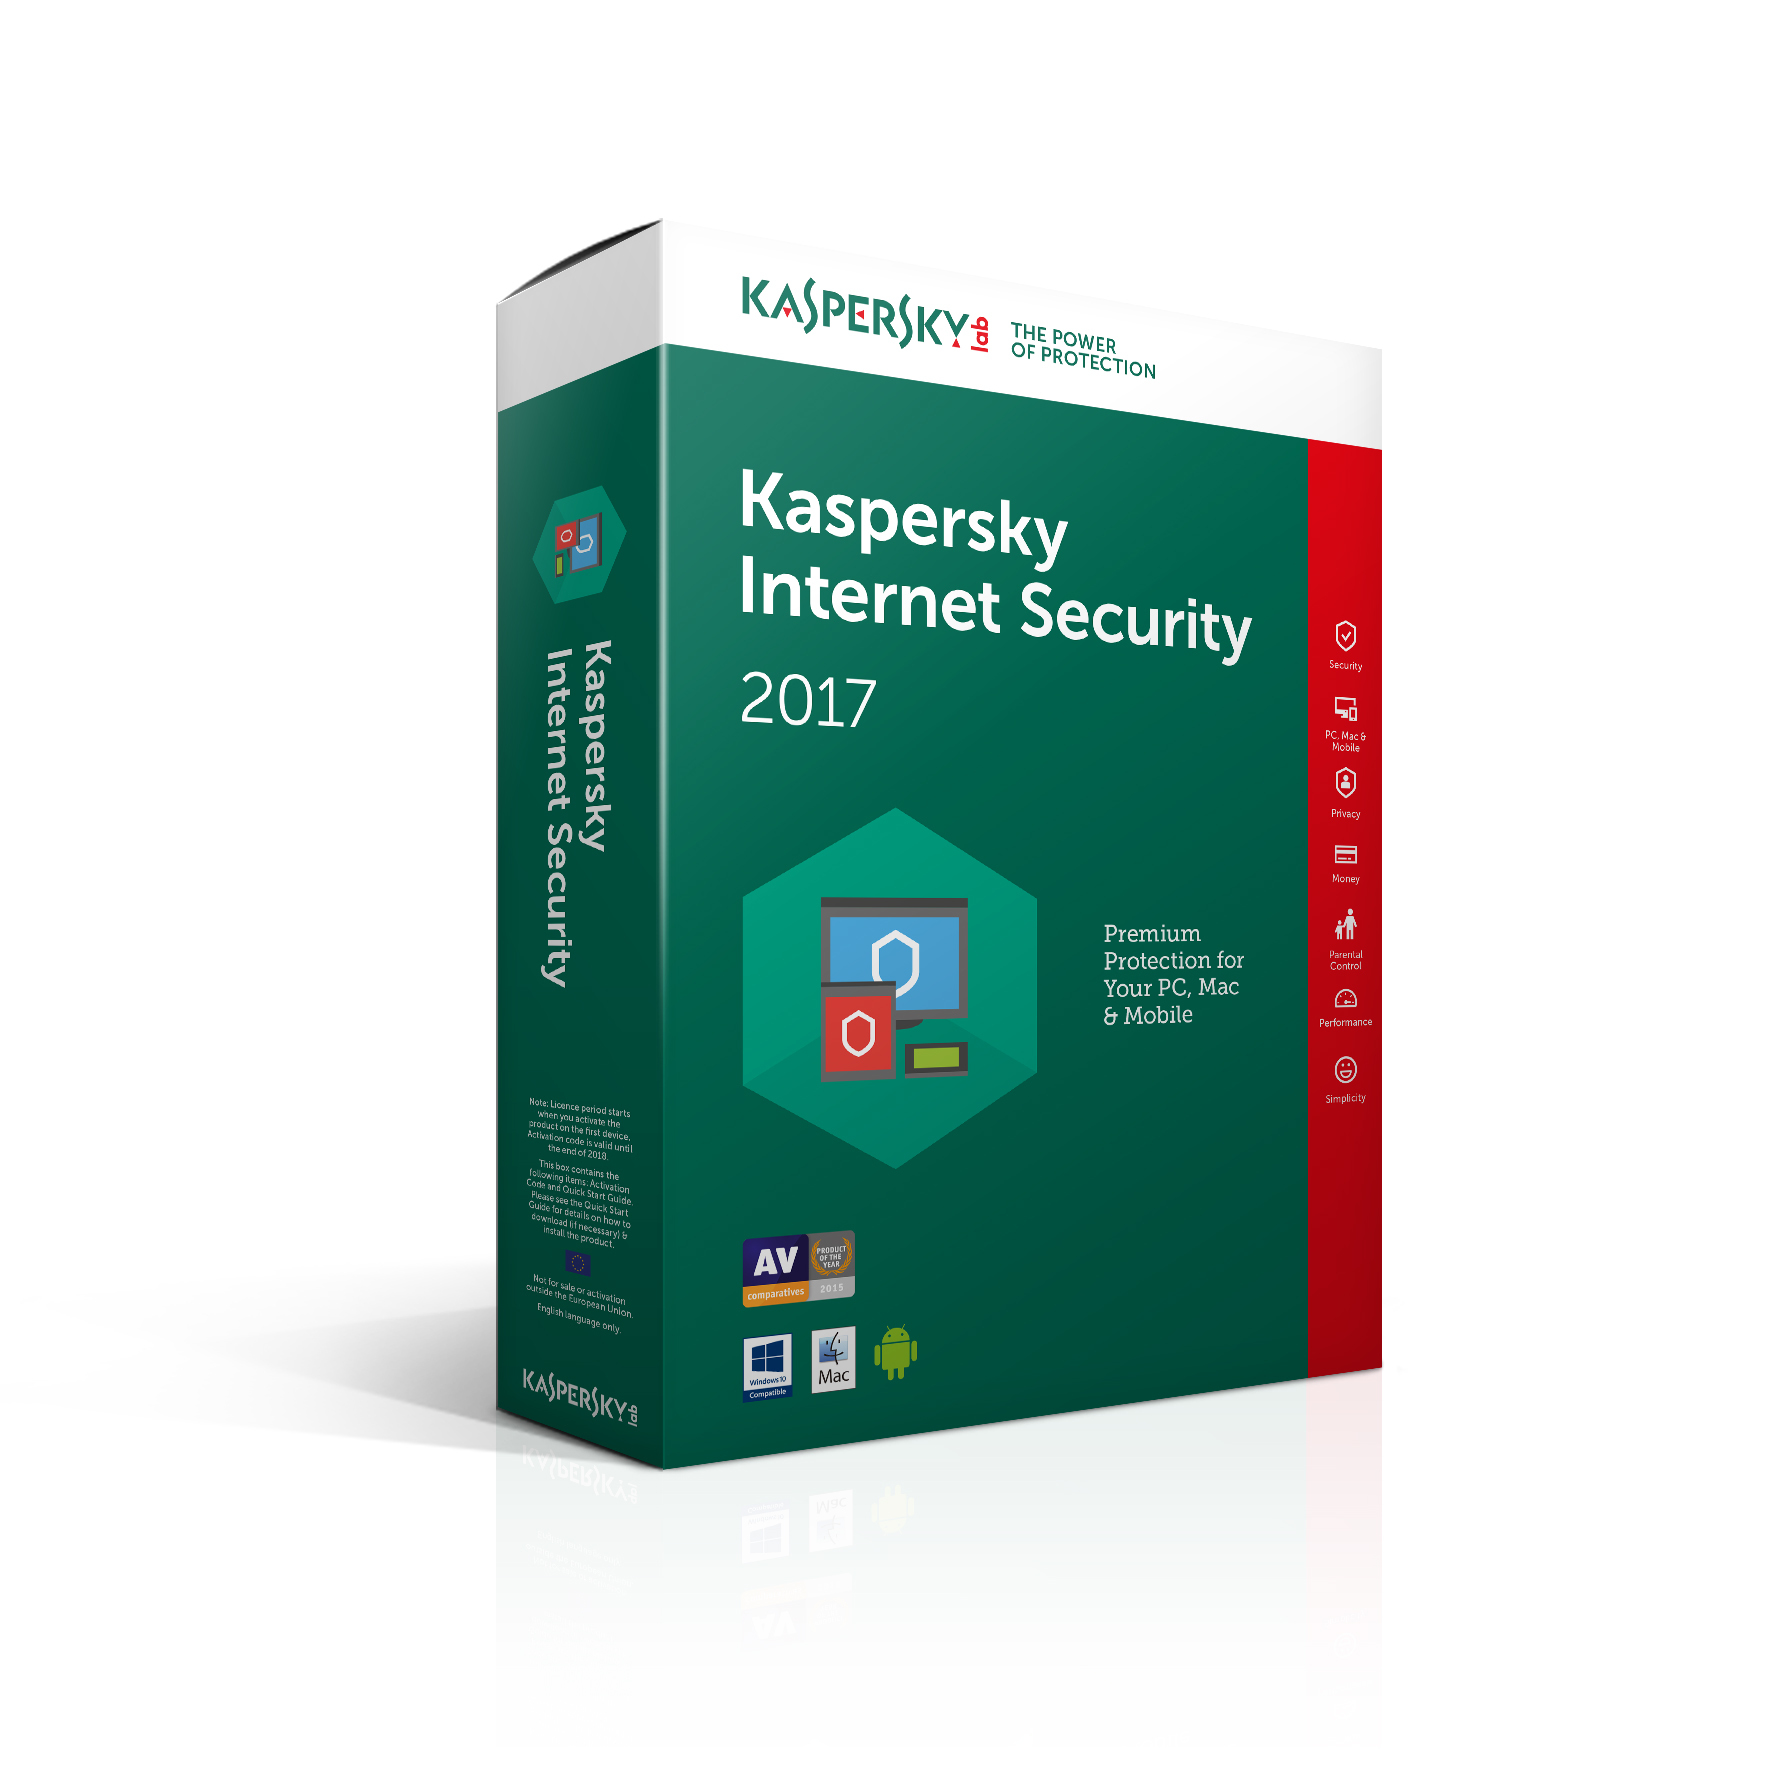 Kaspersky Lab Kaspersky Internet Security 2017 - 10 Devices 1 Year (Standard Packaging)